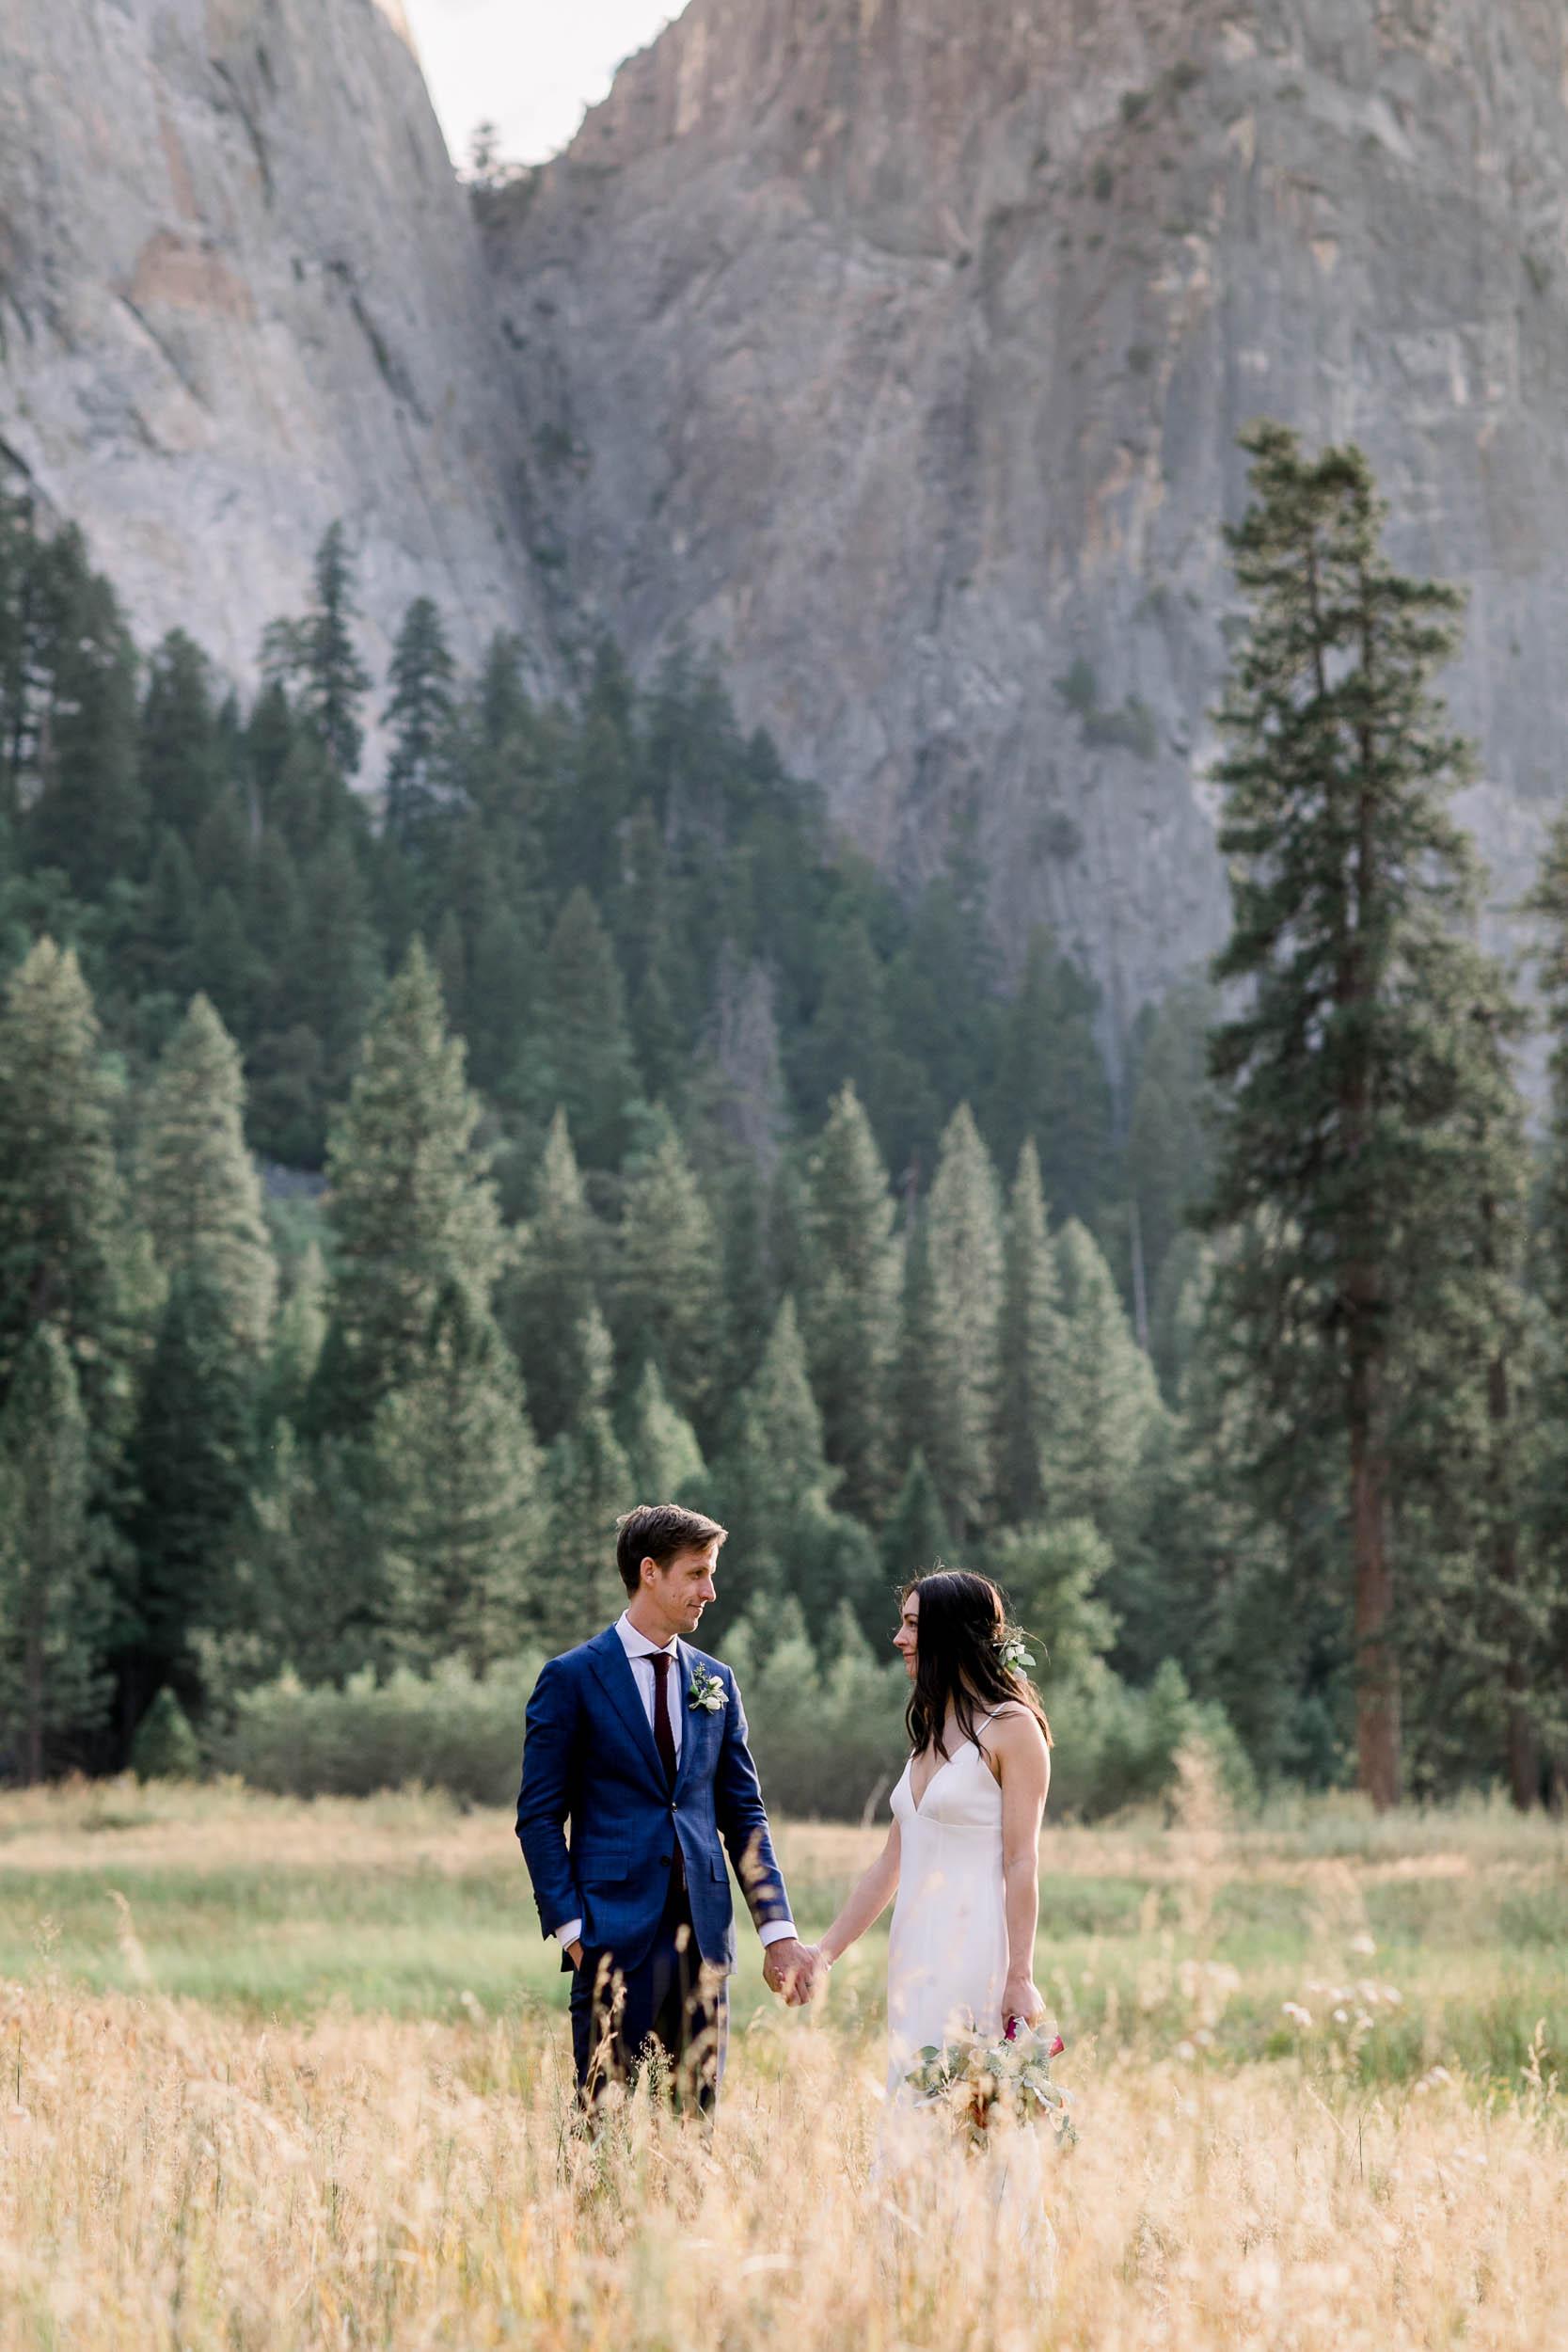 Intimate Yosemite Wedding_Buena Lane Photography_091318ER502.jpg